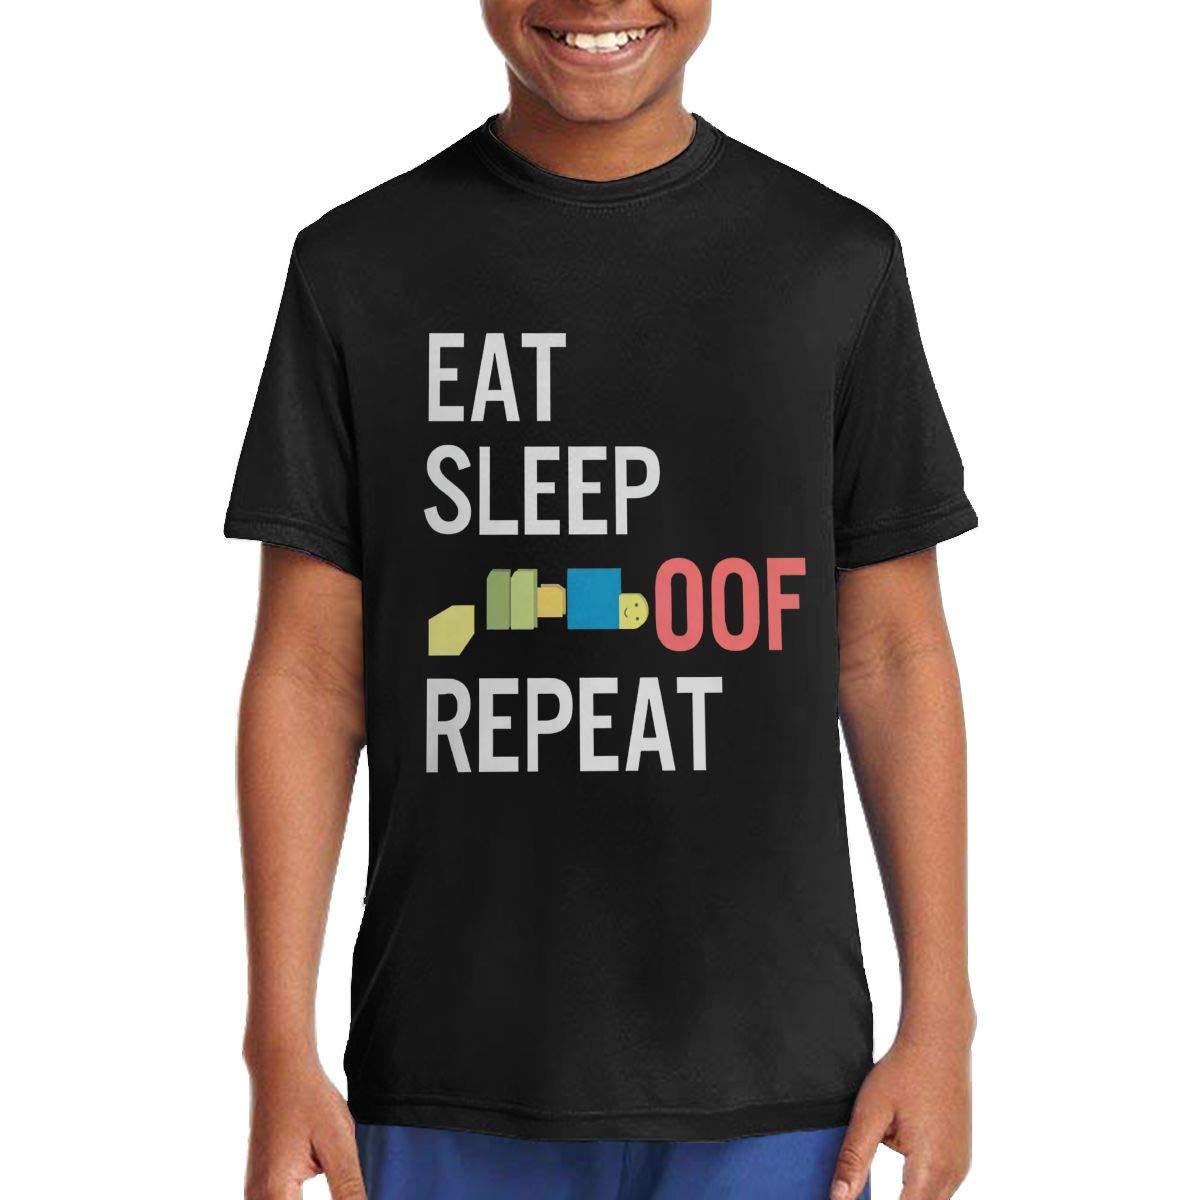 Peilianfactory Childrens OOF Boys Girls Gamer Gaming Cute T-Shirts for Girls//Boys T-Shirts Black